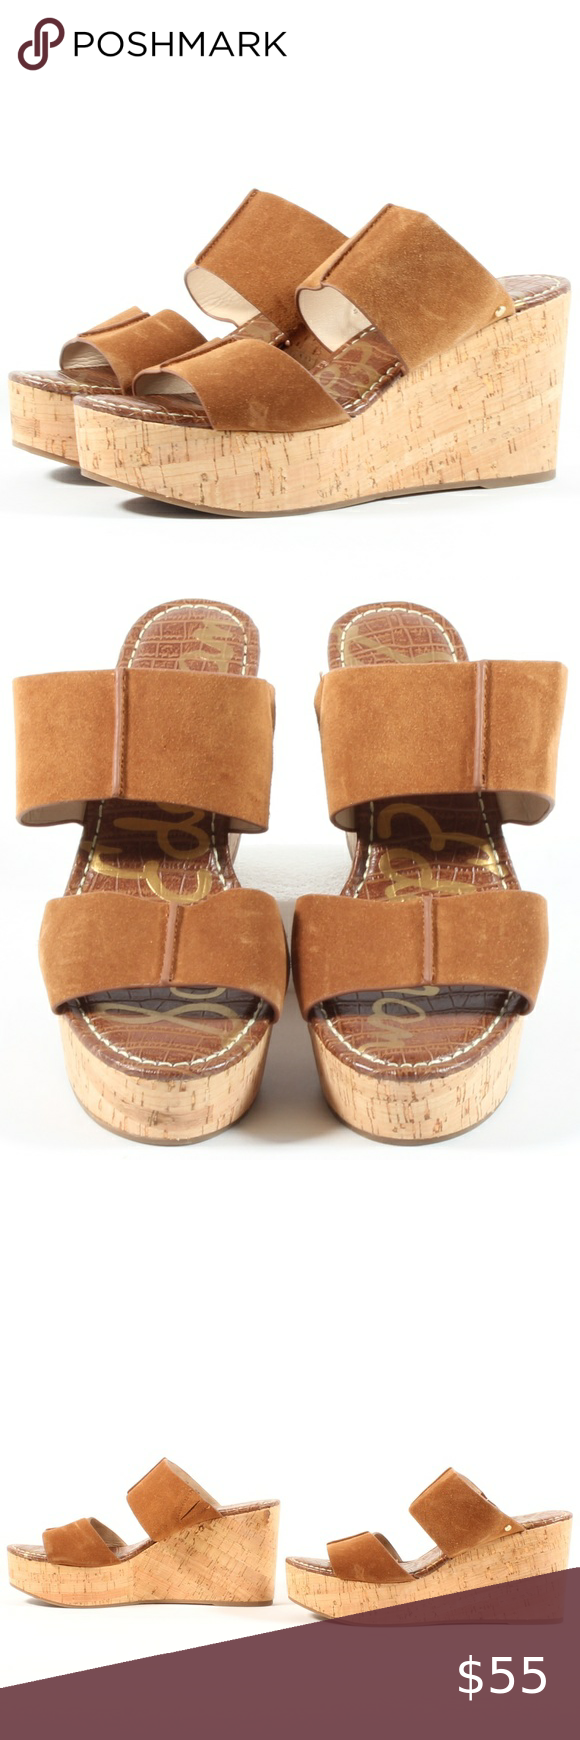 Sam edelman shoes, Womens shoes wedges